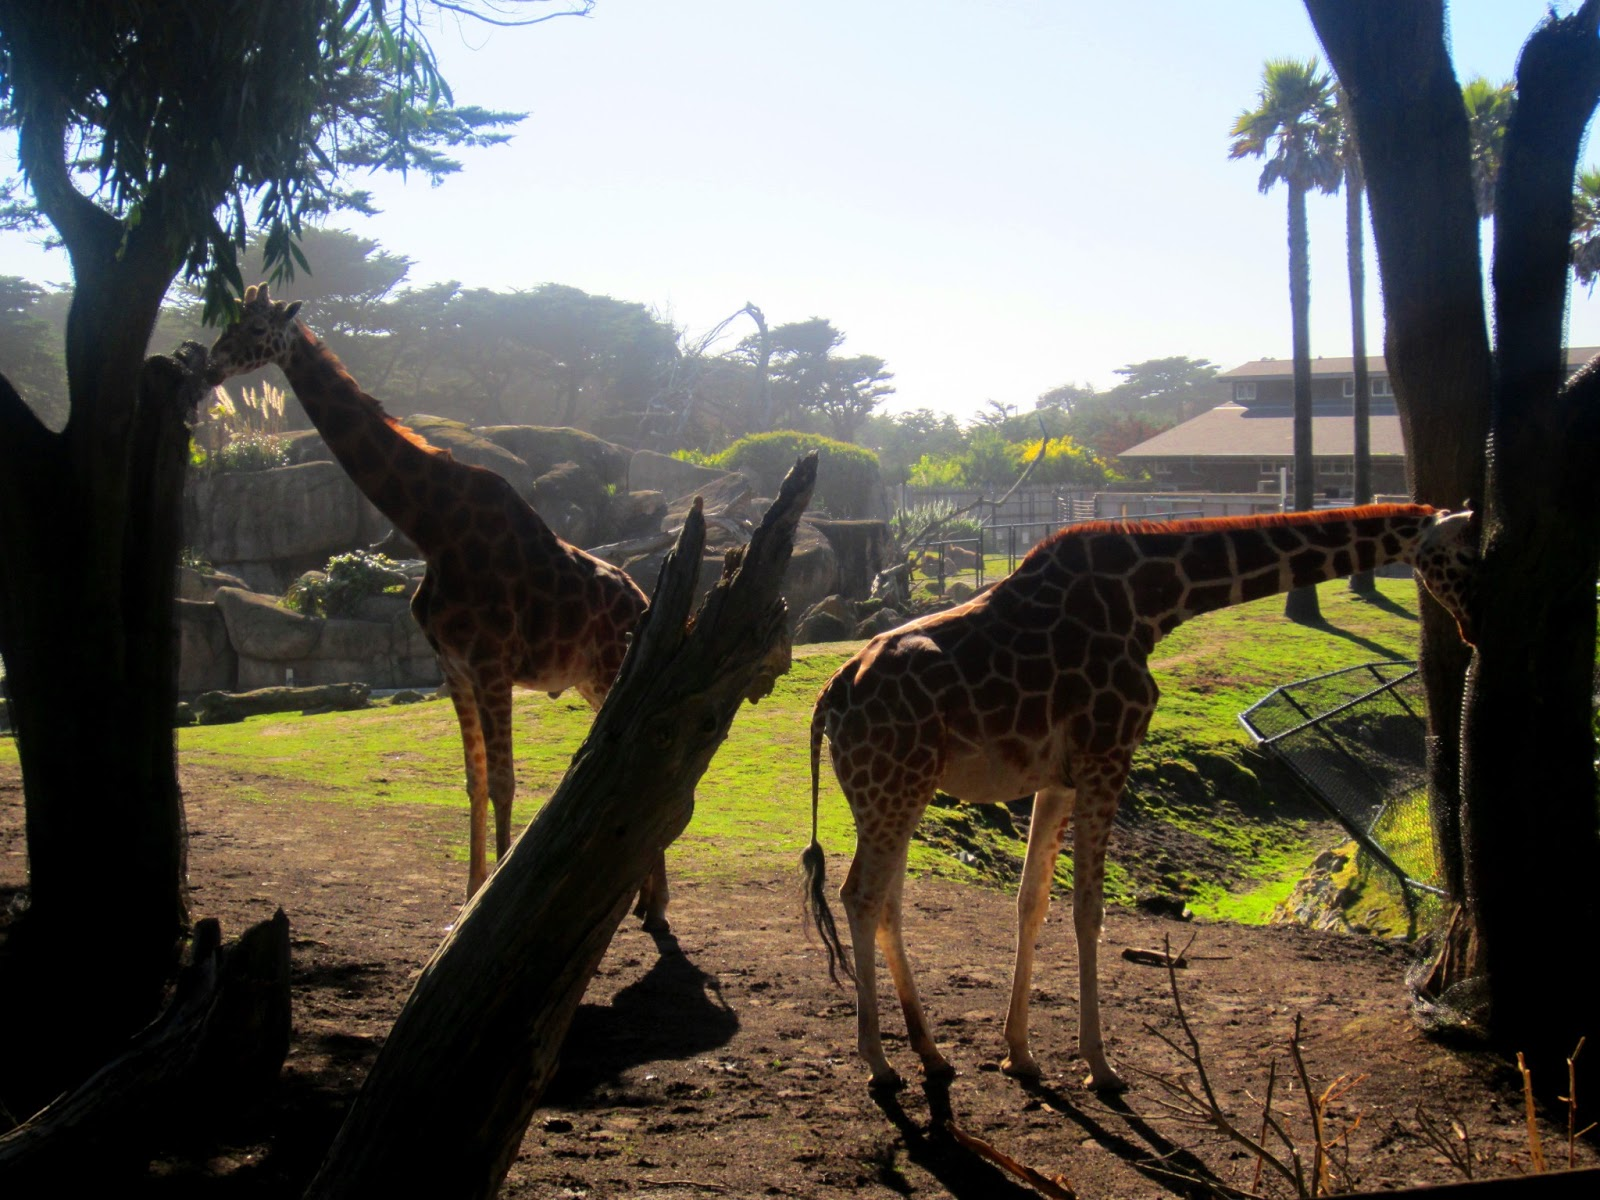 mit liv som Givskud Zoo rabat